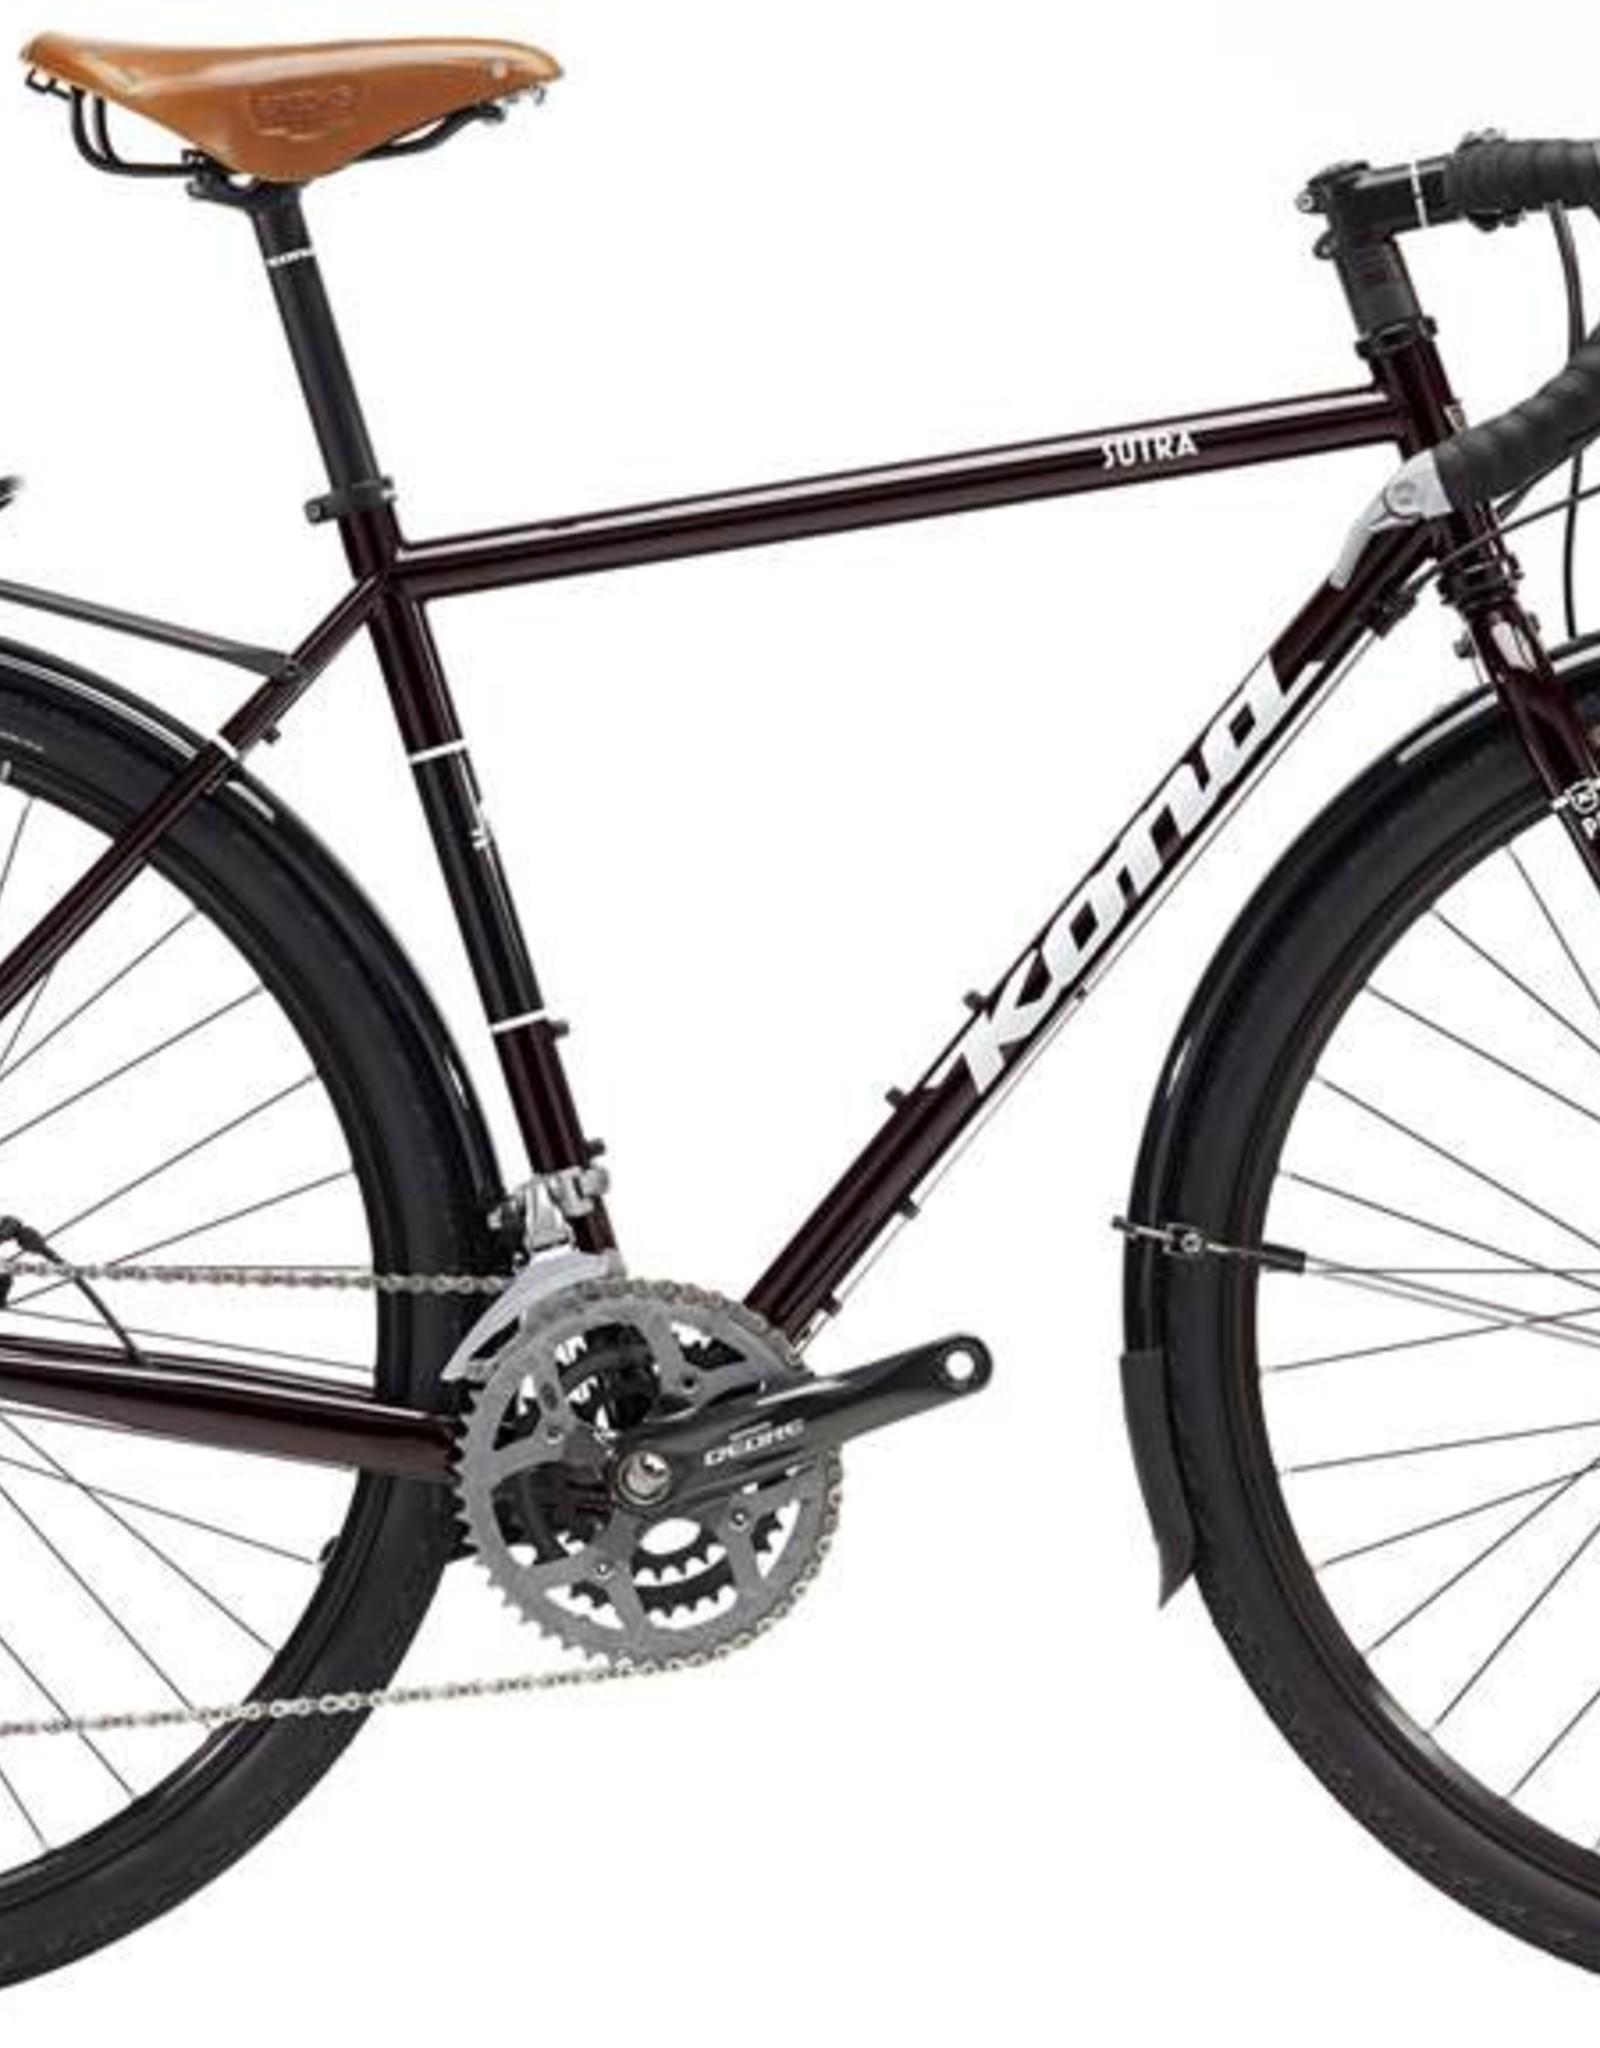 KONA Kona Sutra 2017 Dark Red/Black Bicycle